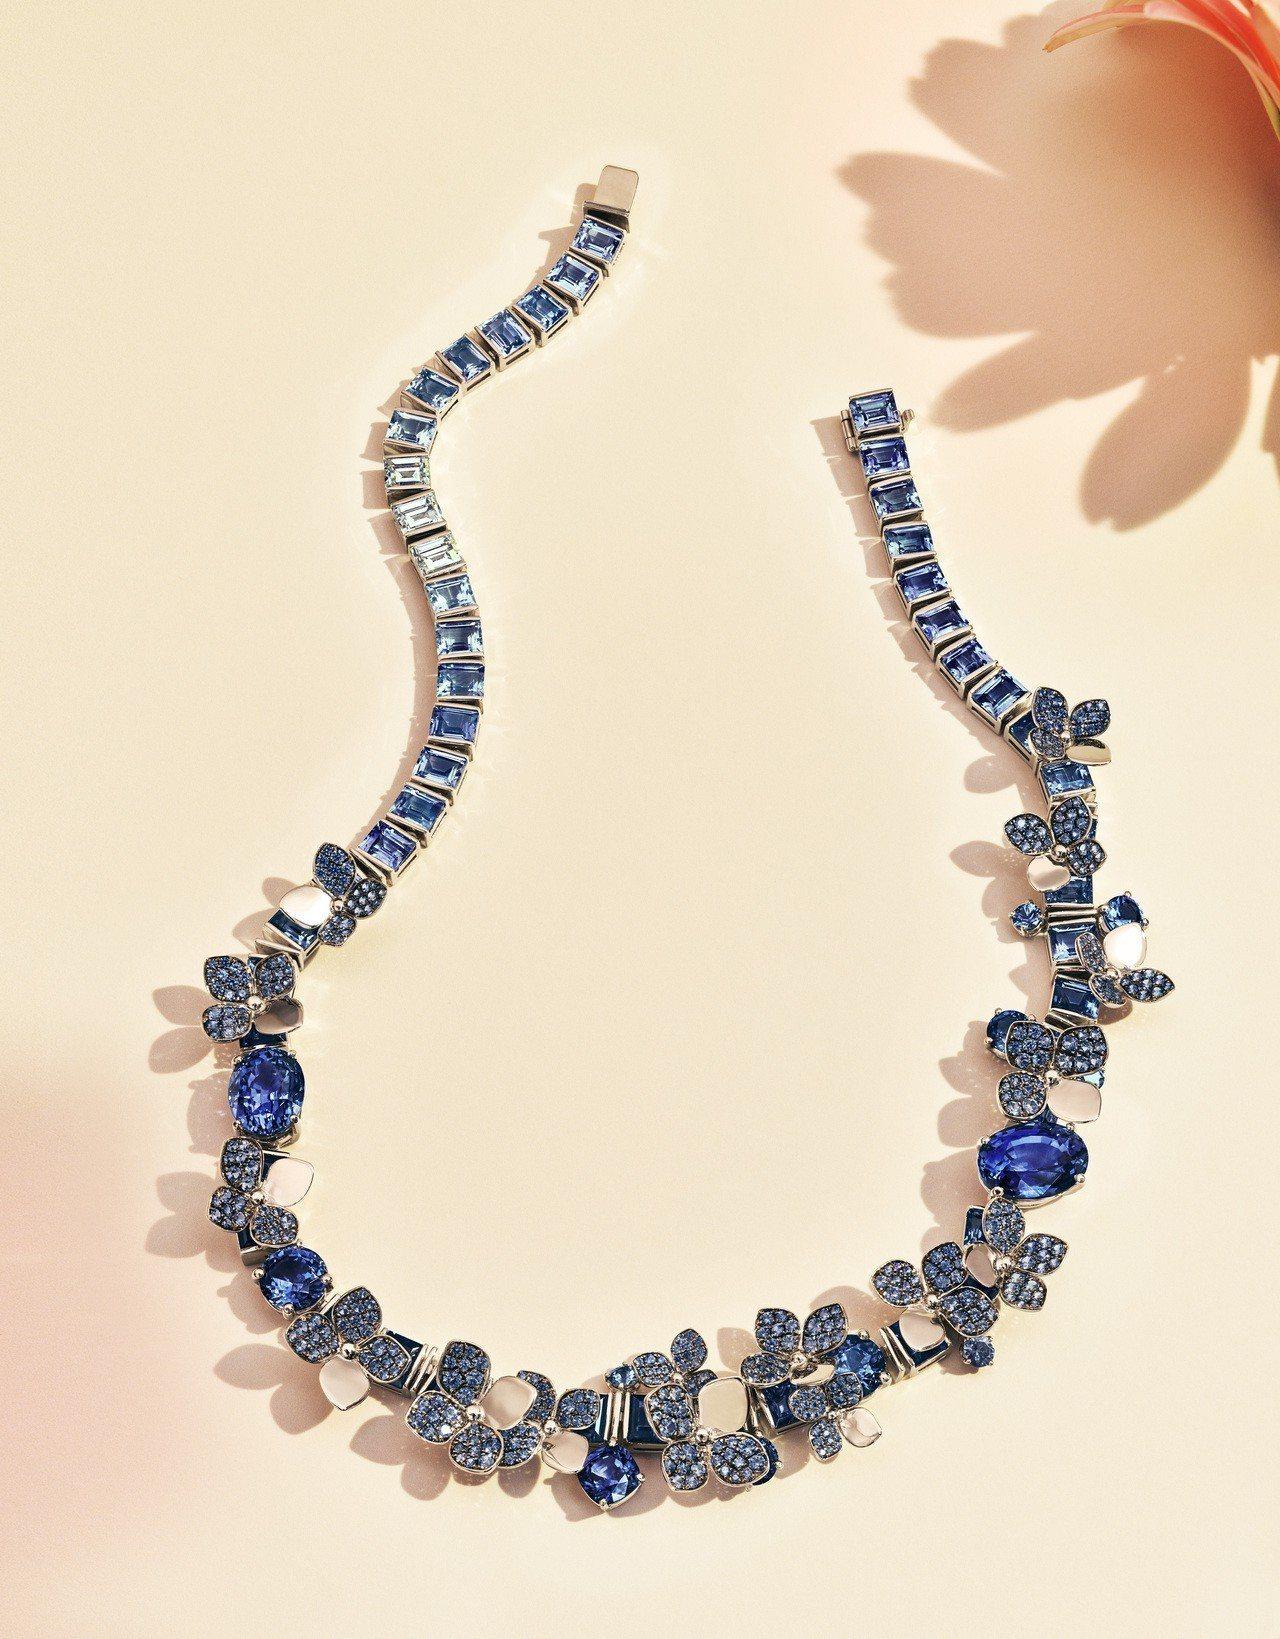 Tiffany 2018 Blue Book系列春季主題,鉑金鑲嵌逾74克拉混合...